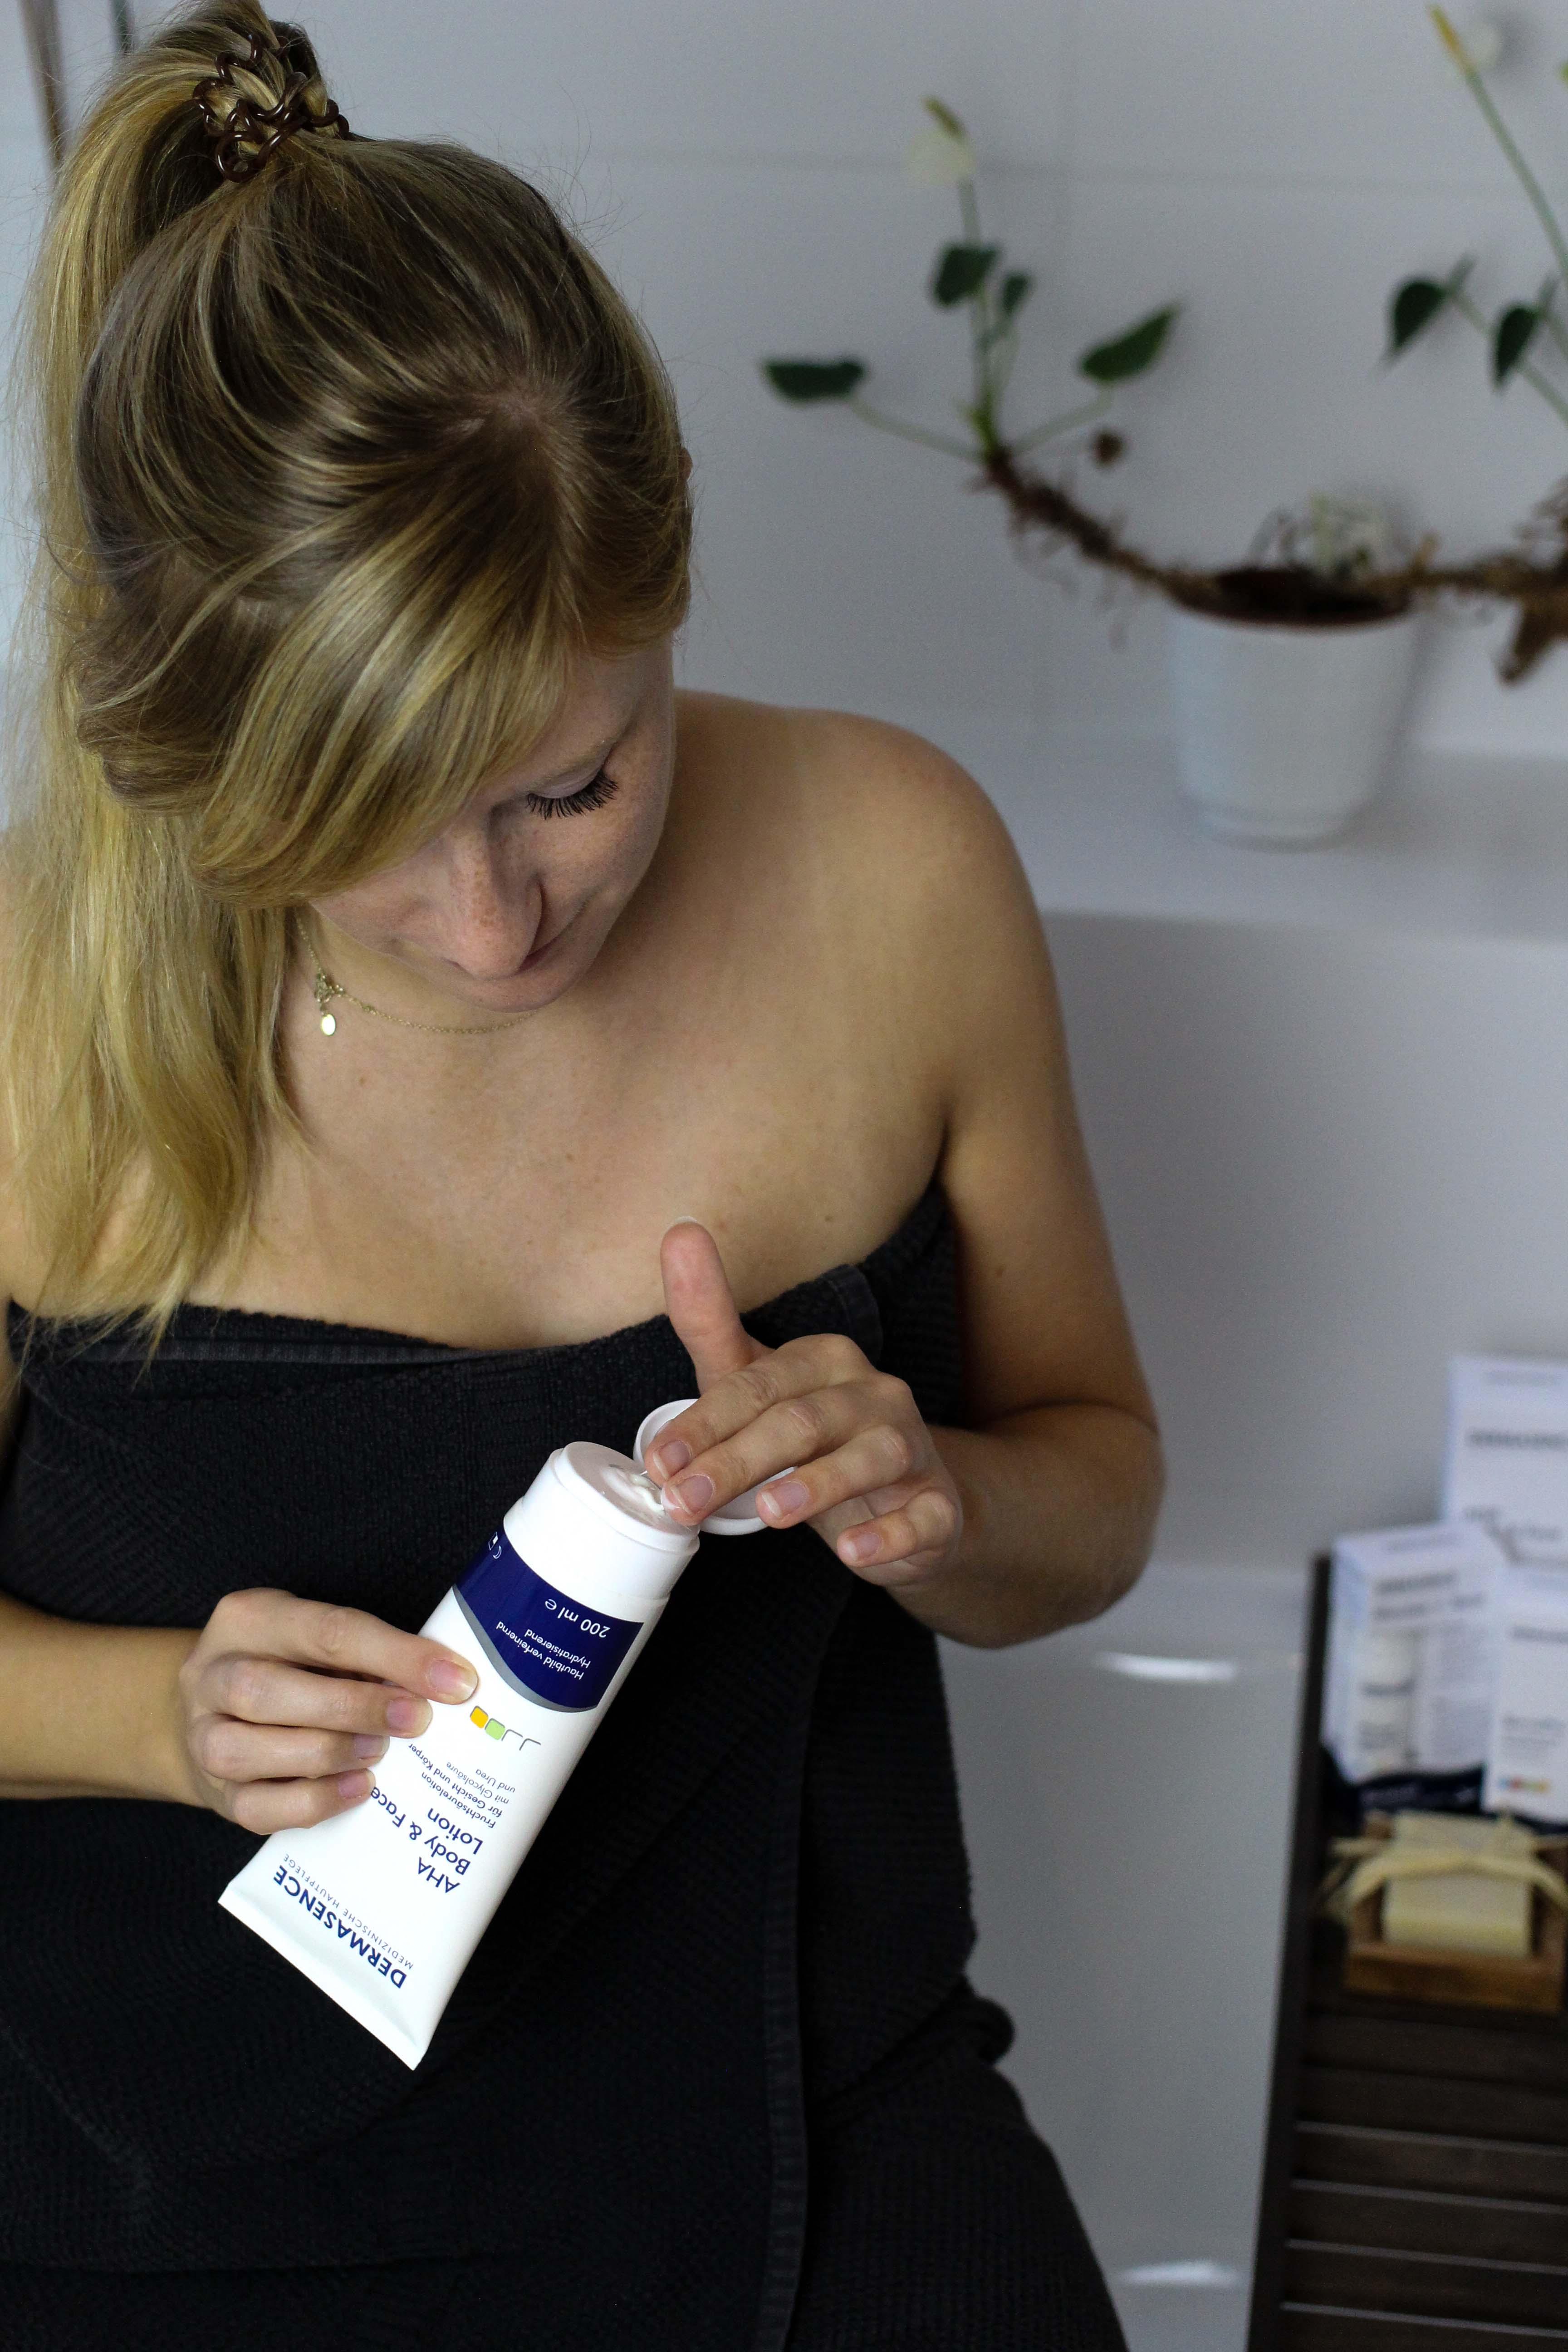 Blogger Adventskalender Gewinnspiel Dermasence Hautpflege Reisen Solvinea Med LSF 50 Beauty Blogger Tipps Anwendung